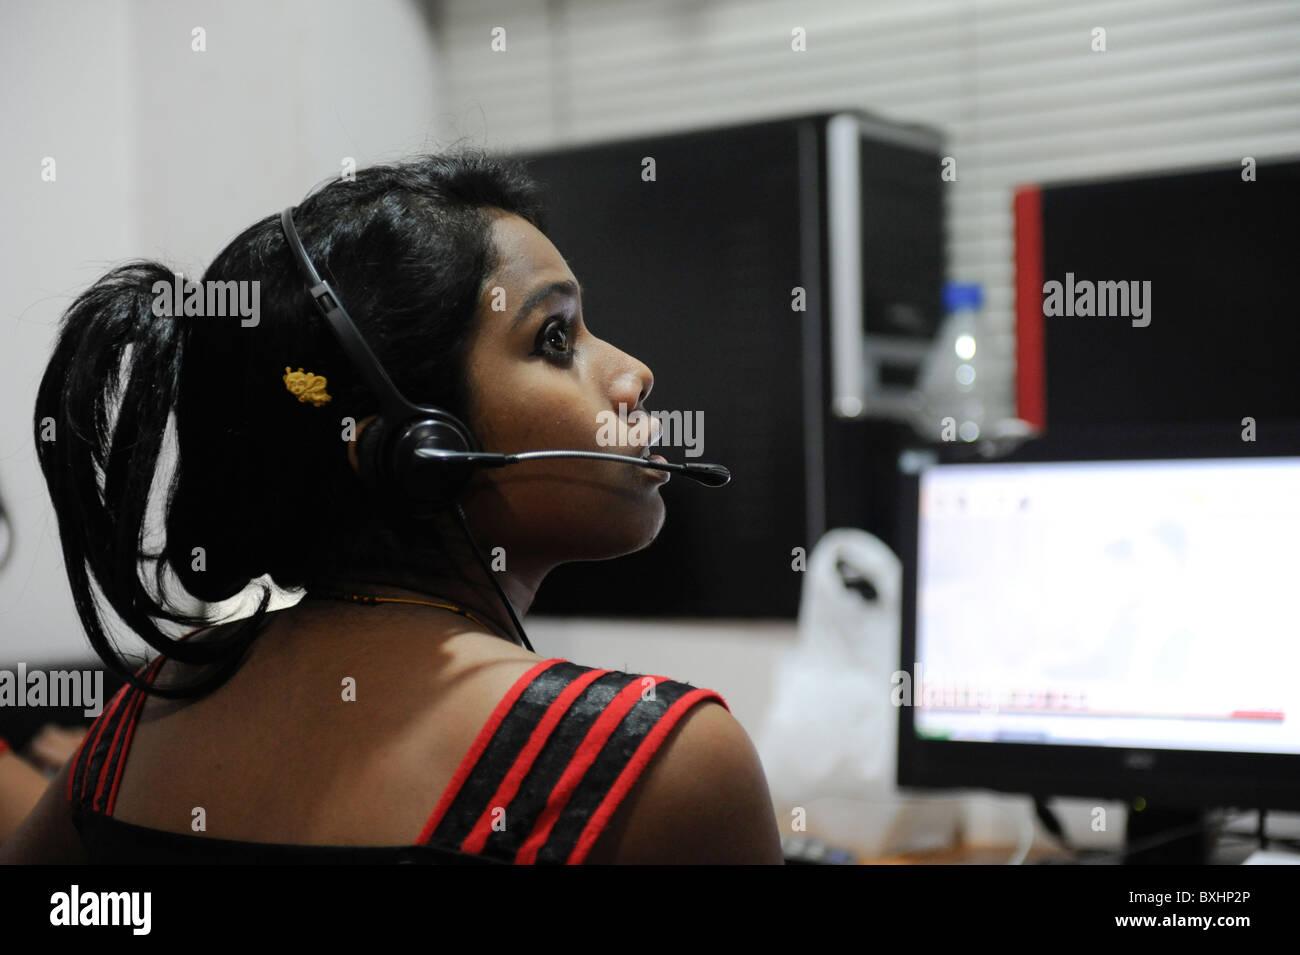 South Asia INDIA Kolkata Calcutta , young women work in call center calling US or UK customer - Stock Image